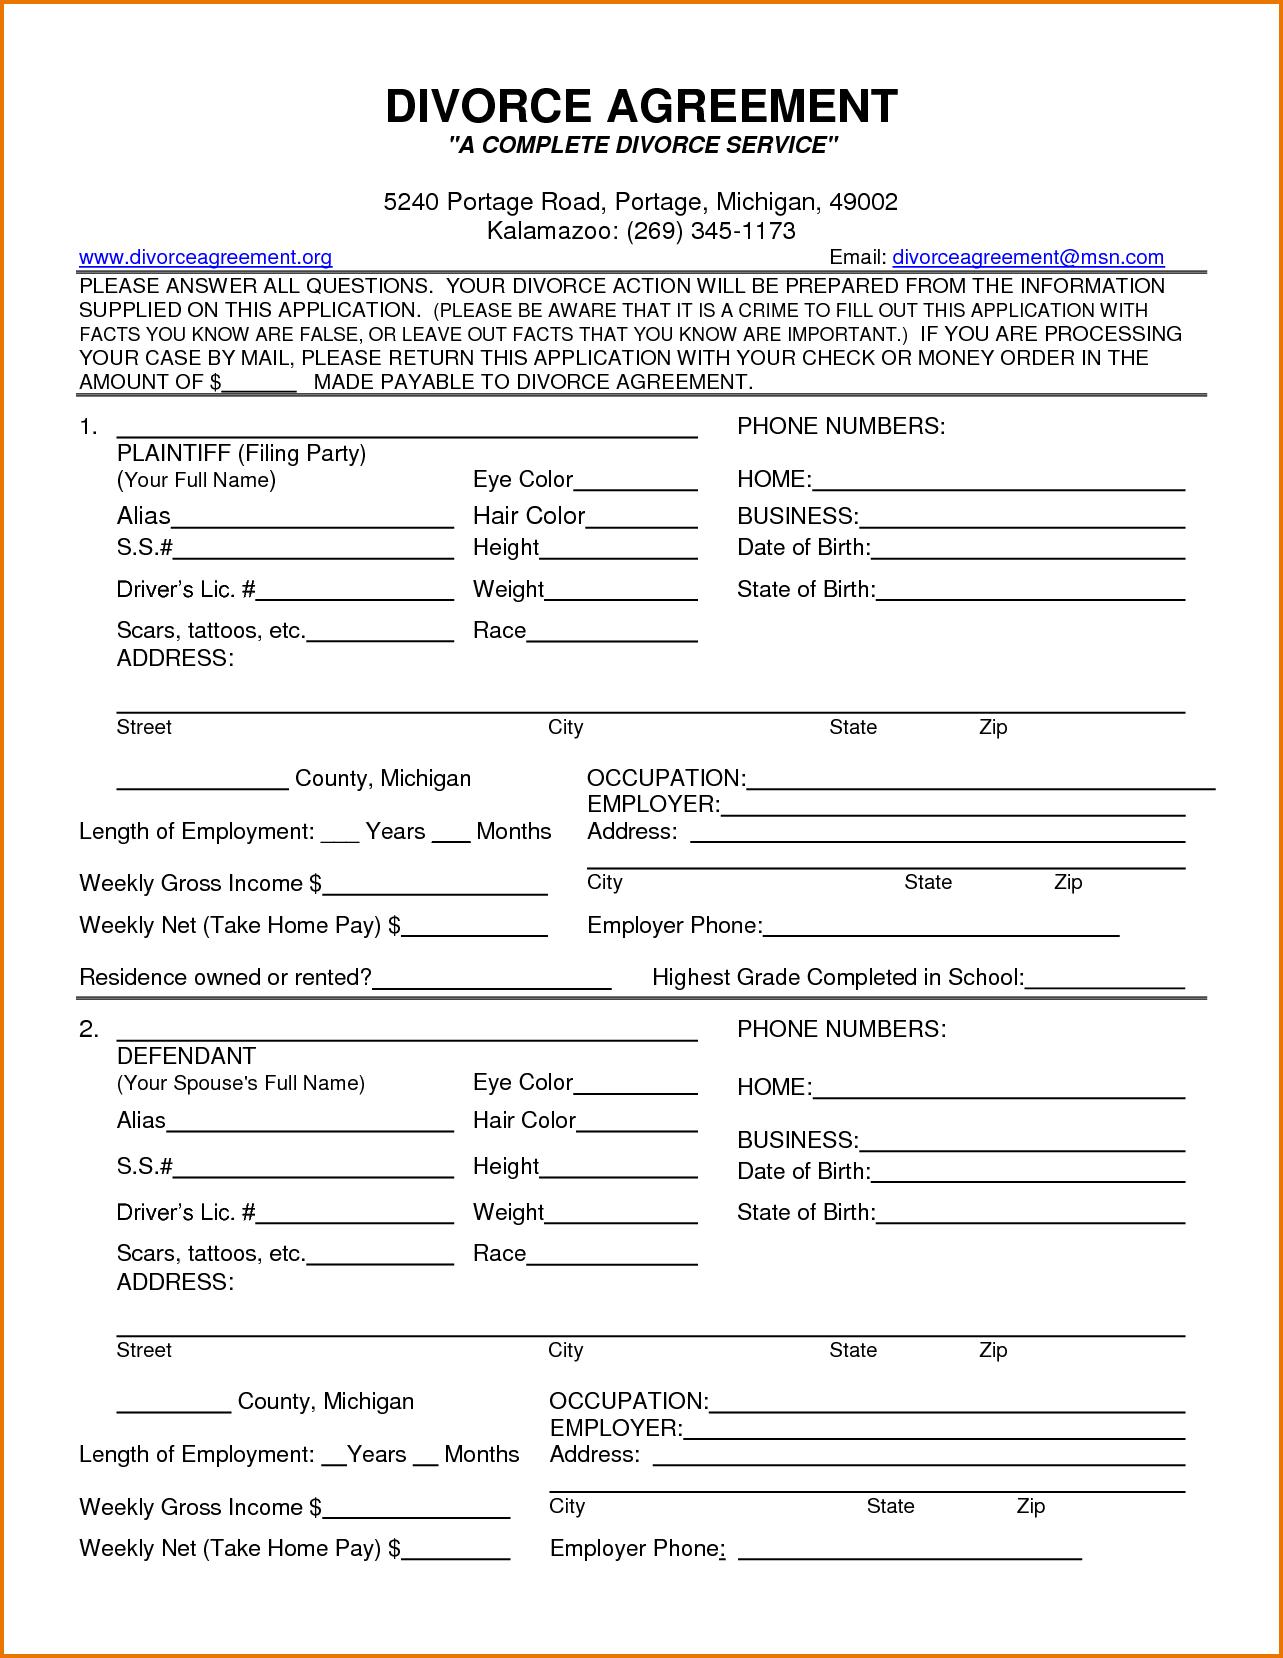 Printable Divorce Papers Georgia   6 Ways To Ruin A Perfectly Good - Free Printable Divorce Papers For Arkansas